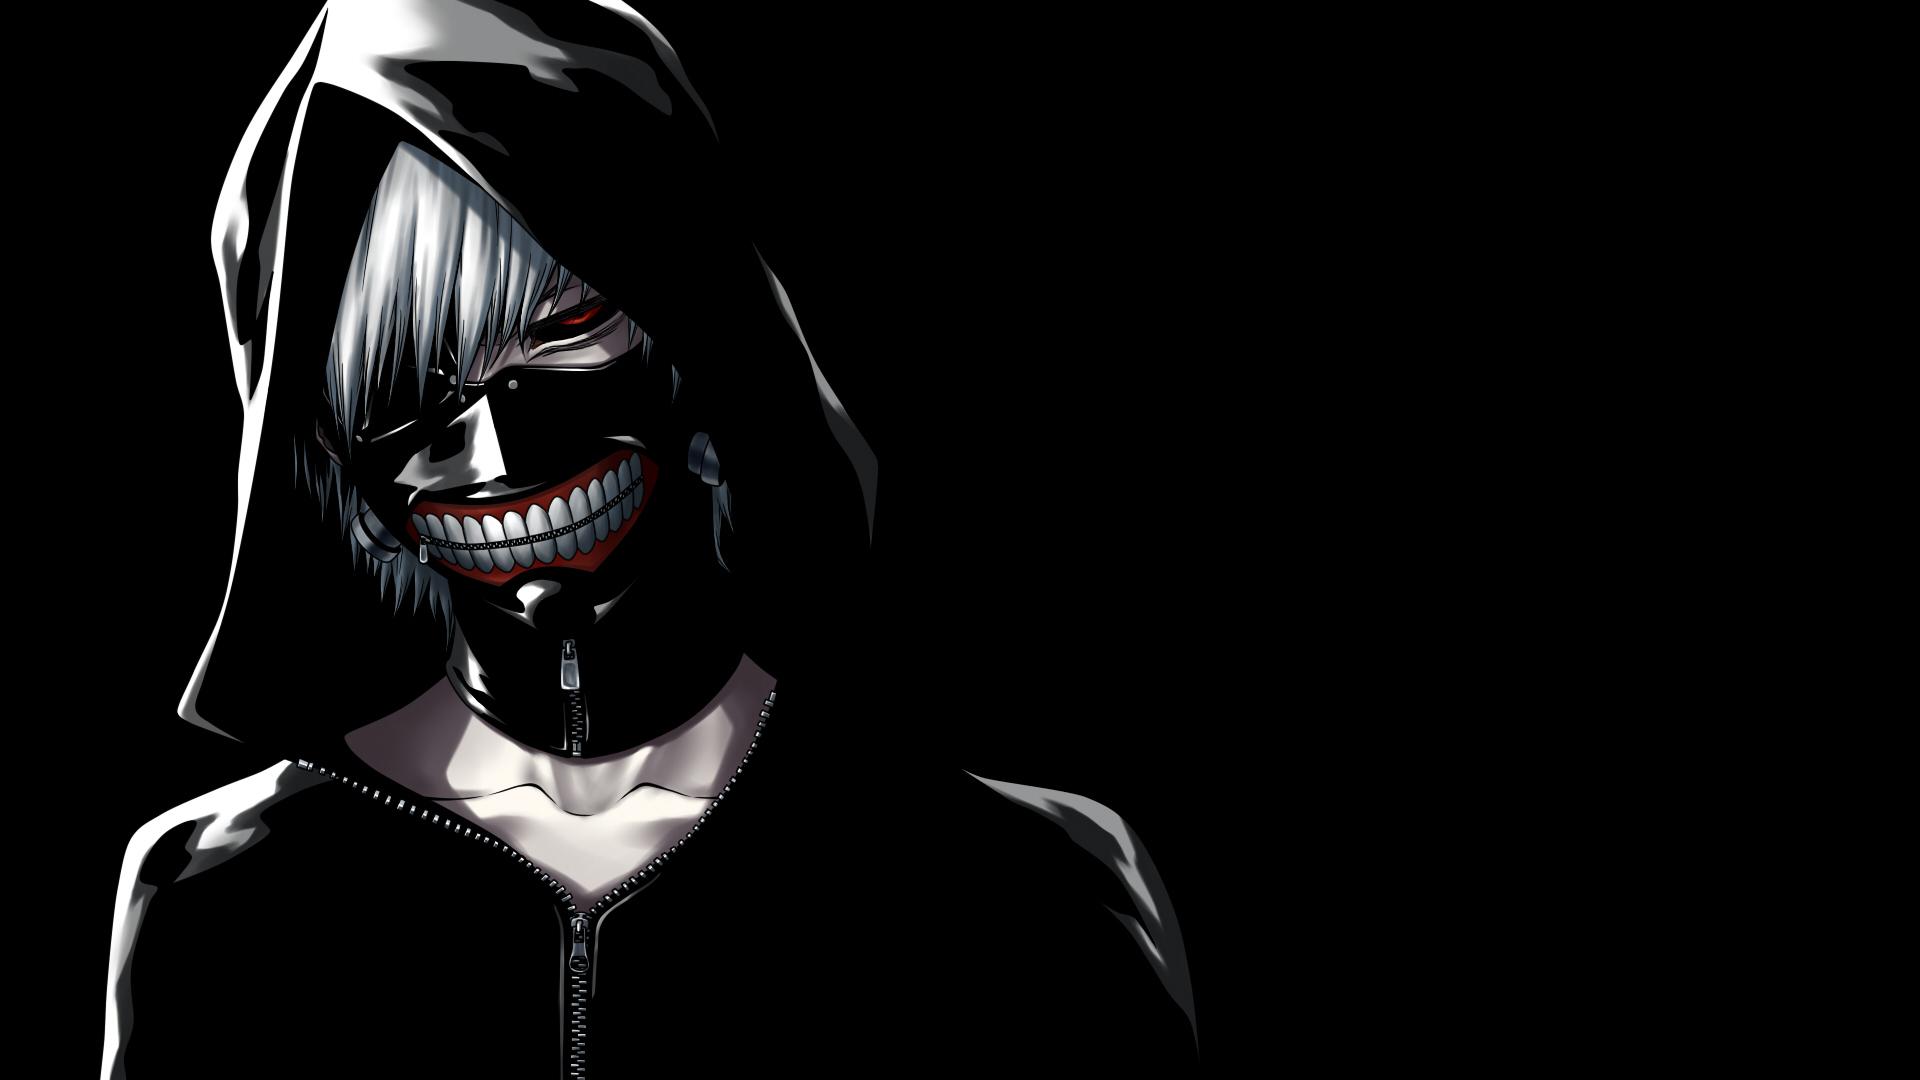 Masque Tokyo Ghoul Kaneki Ken Capuche Jeune homme mec, adolescent Anime